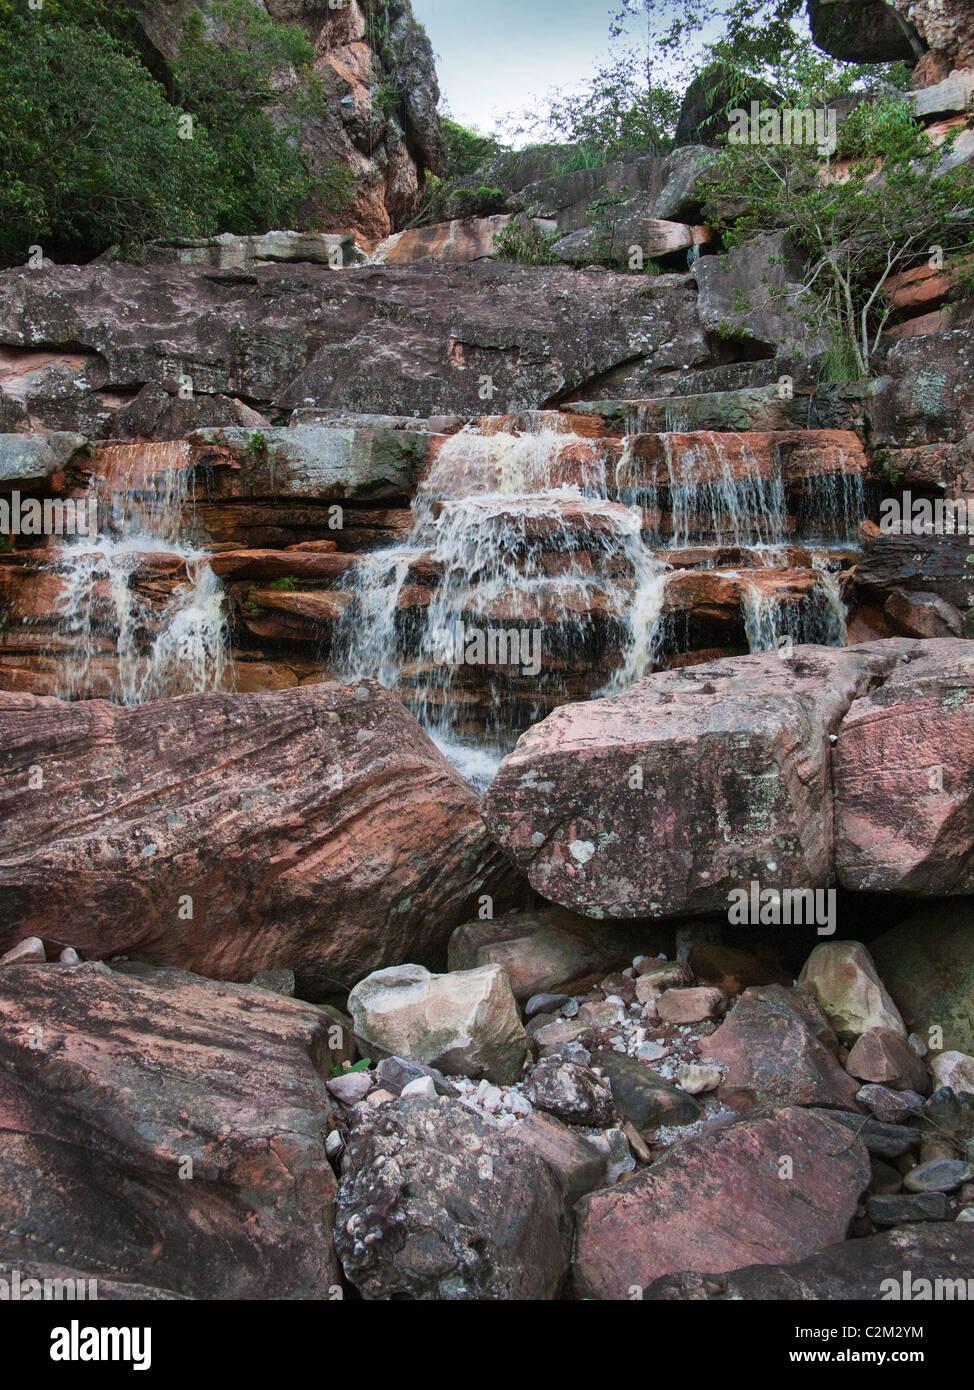 Small waterfalls in Chapada Diamantina, Bahia State, Brazil - Stock Image